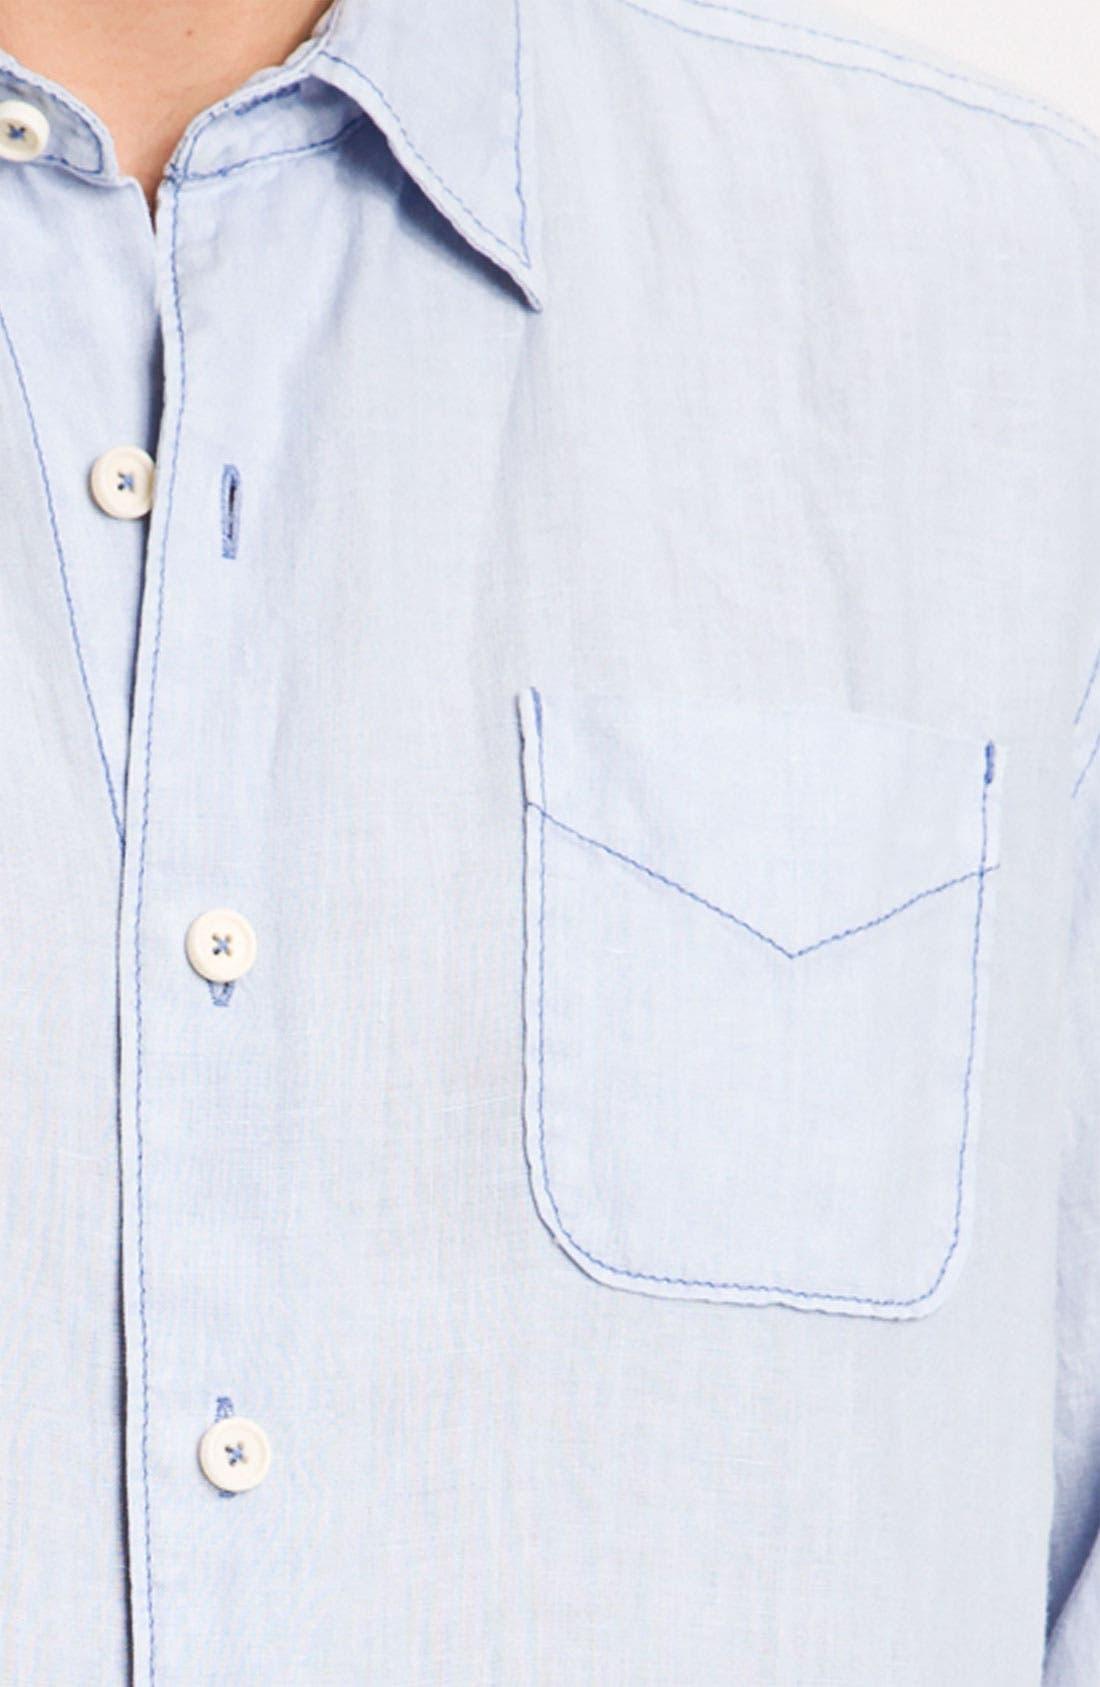 Alternate Image 3  - Tommy Bahama 'Beachy Breezer' Linen Sport Shirt (Big & Tall)